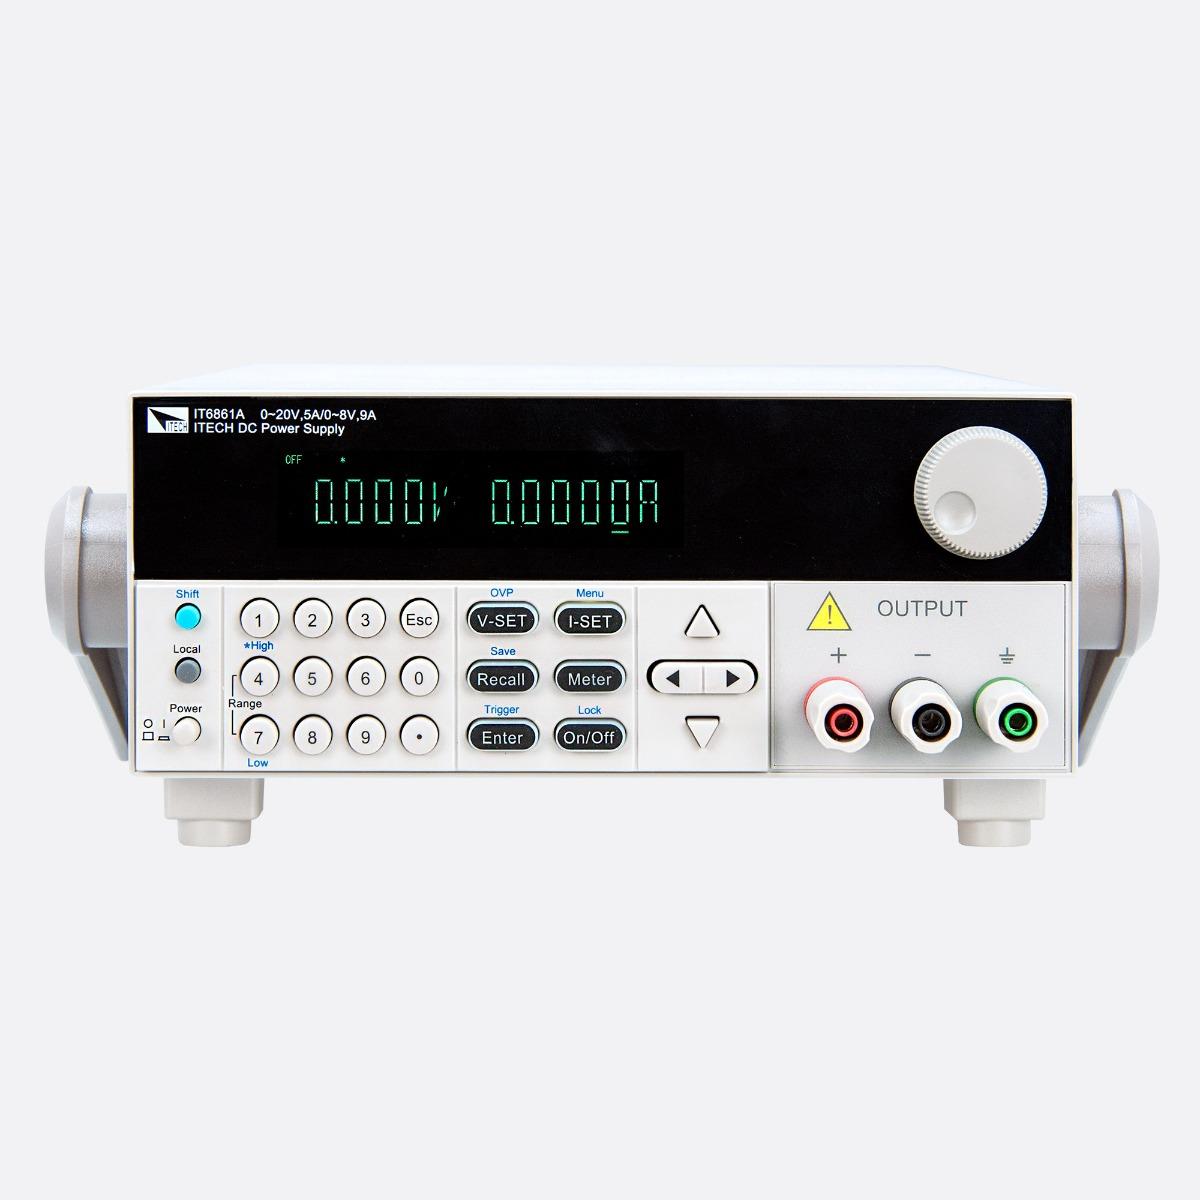 Itech_IT6860A-IT6870A-series_front_Ccontrols